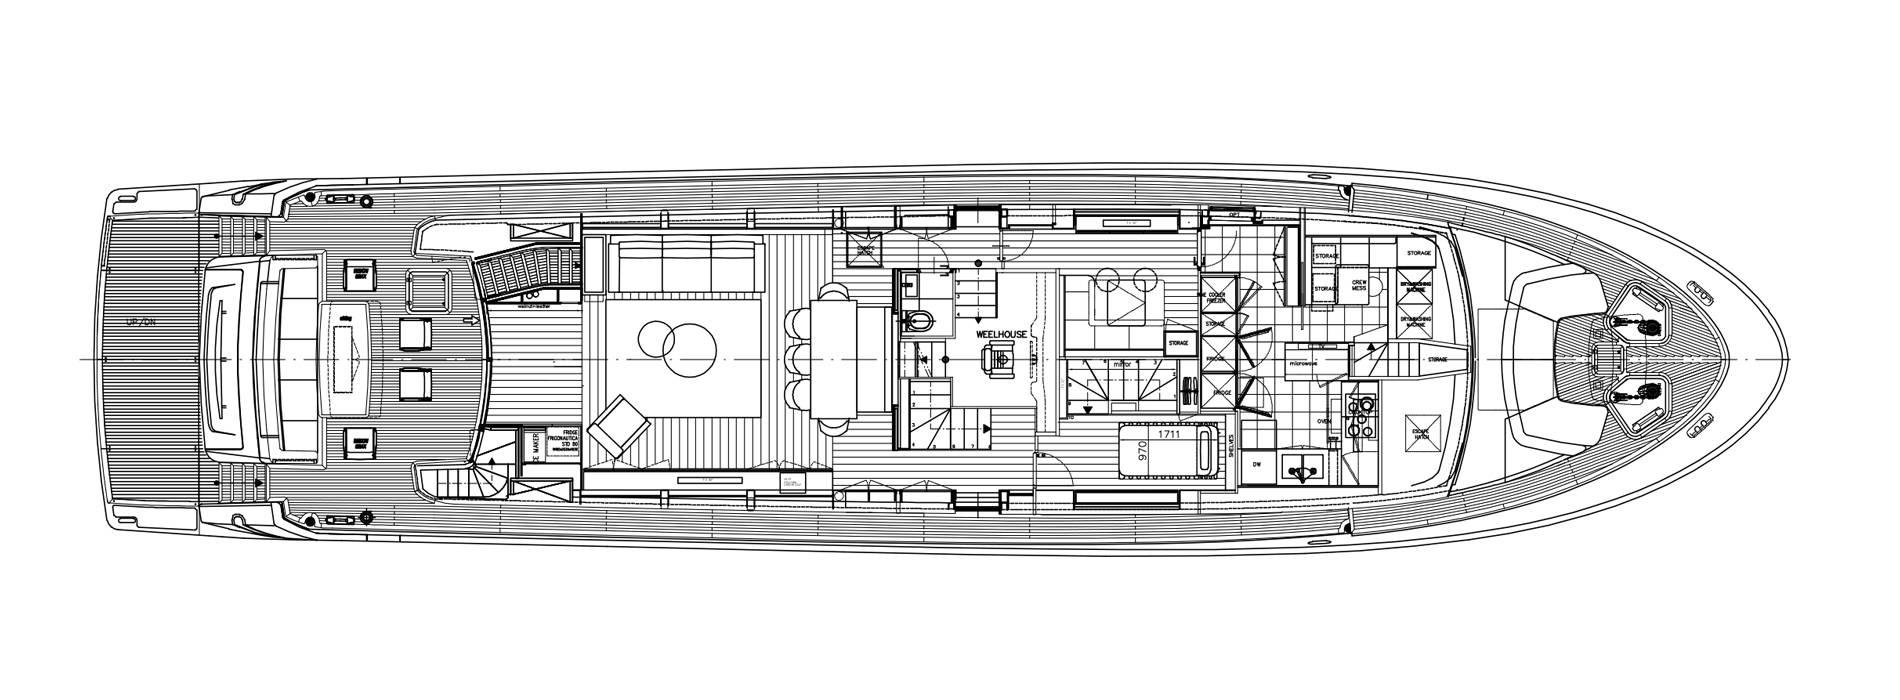 Sanlorenzo Yachts SL96-623 Cubierta principal